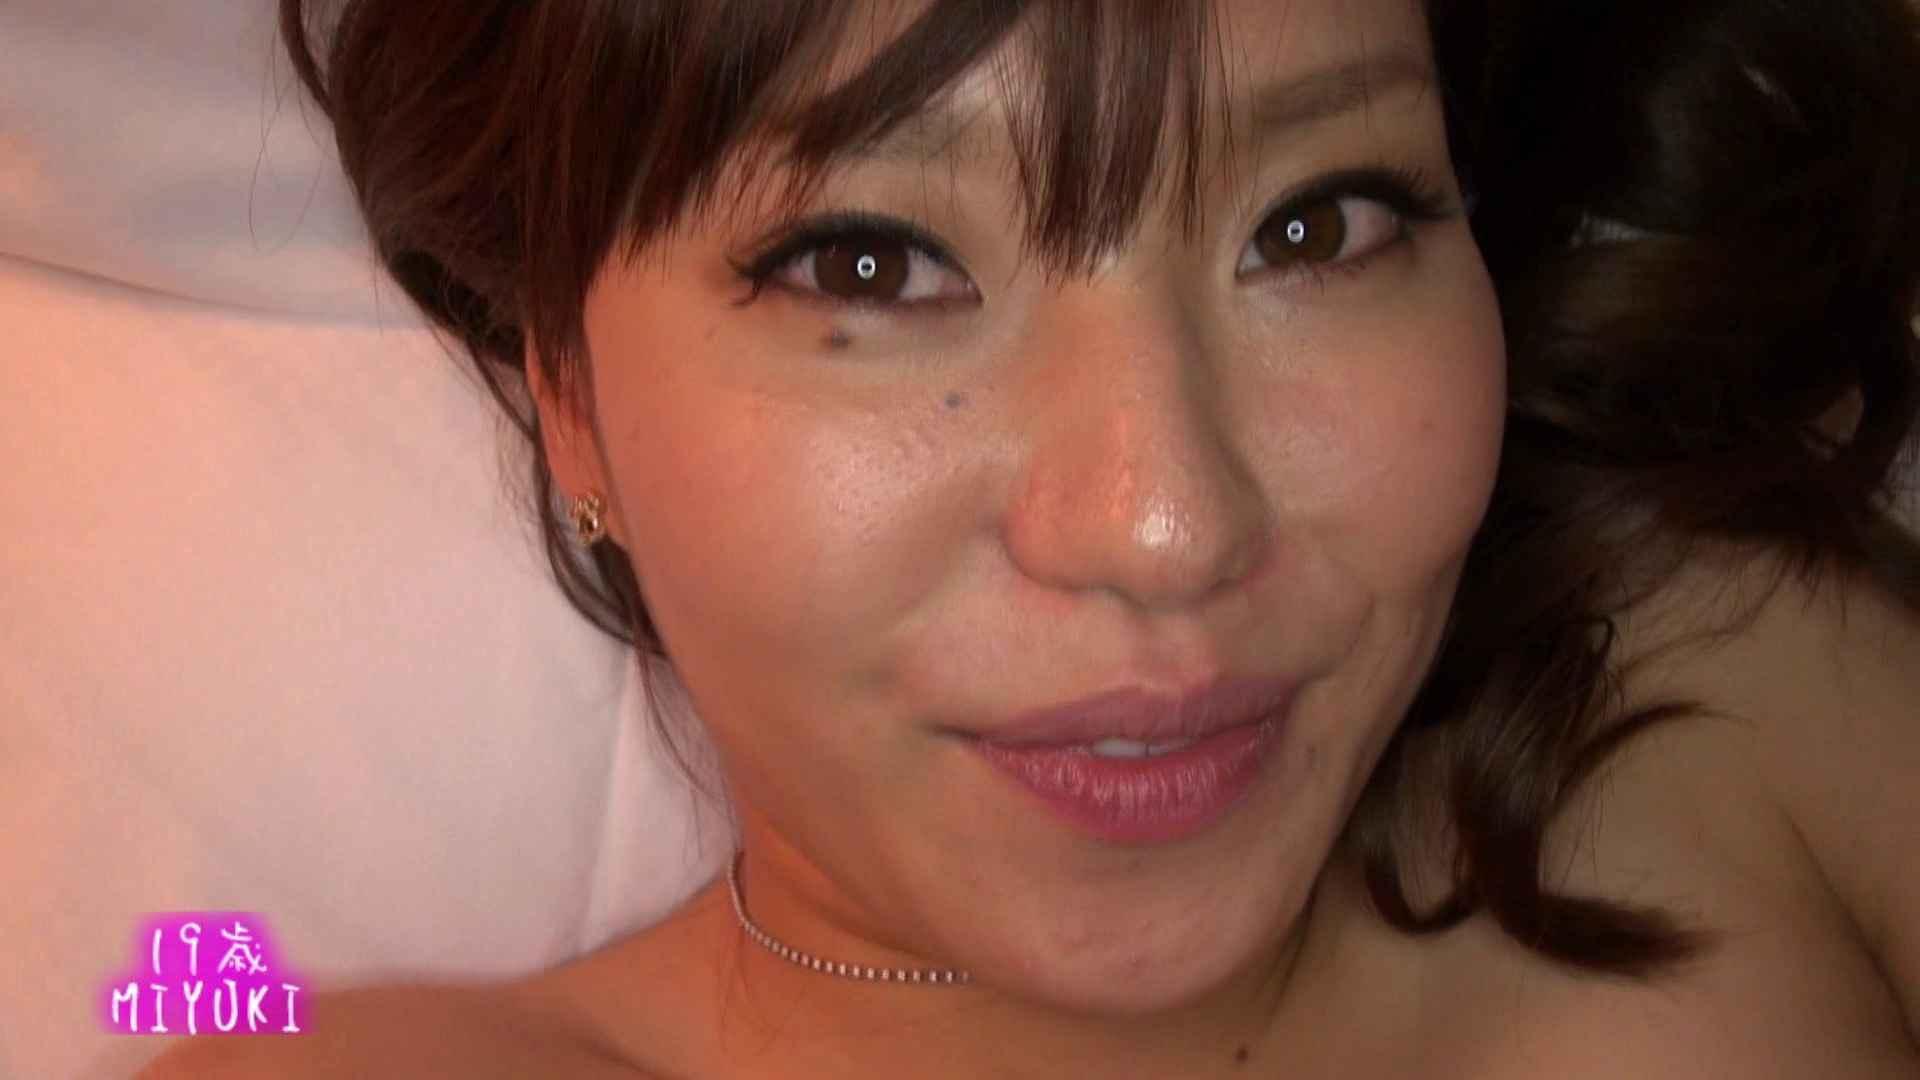 MIYUKIちゃんに男優さんがエロマッサージ 素人  38連発 12